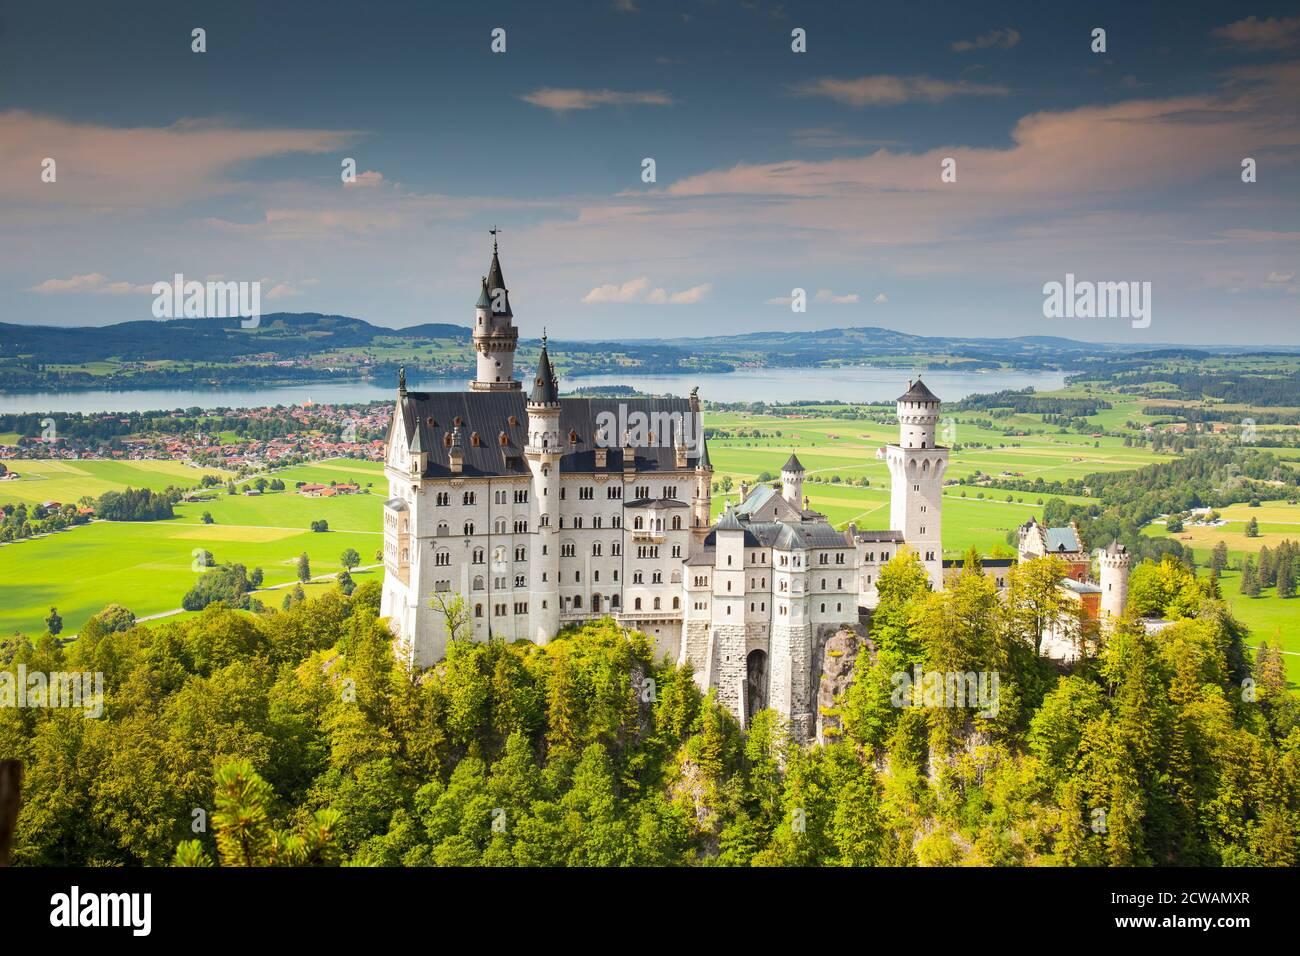 Castello di Neuschwanstein, Schwangau, Alpi Bavaresi, Allgäu, Svevia, Baviera, Germania, Europa Foto Stock